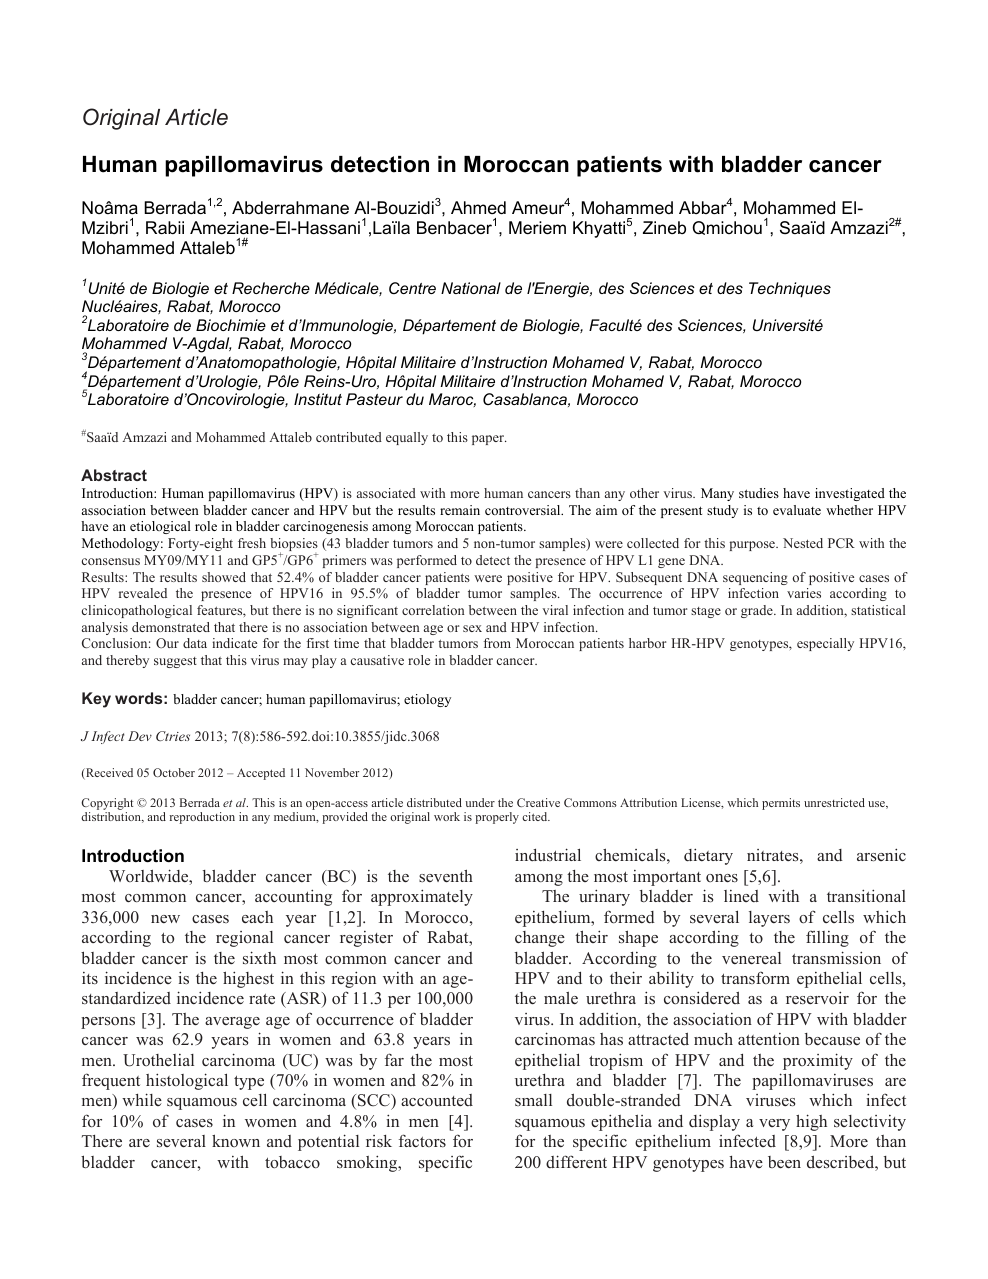 hpv bladder cancer